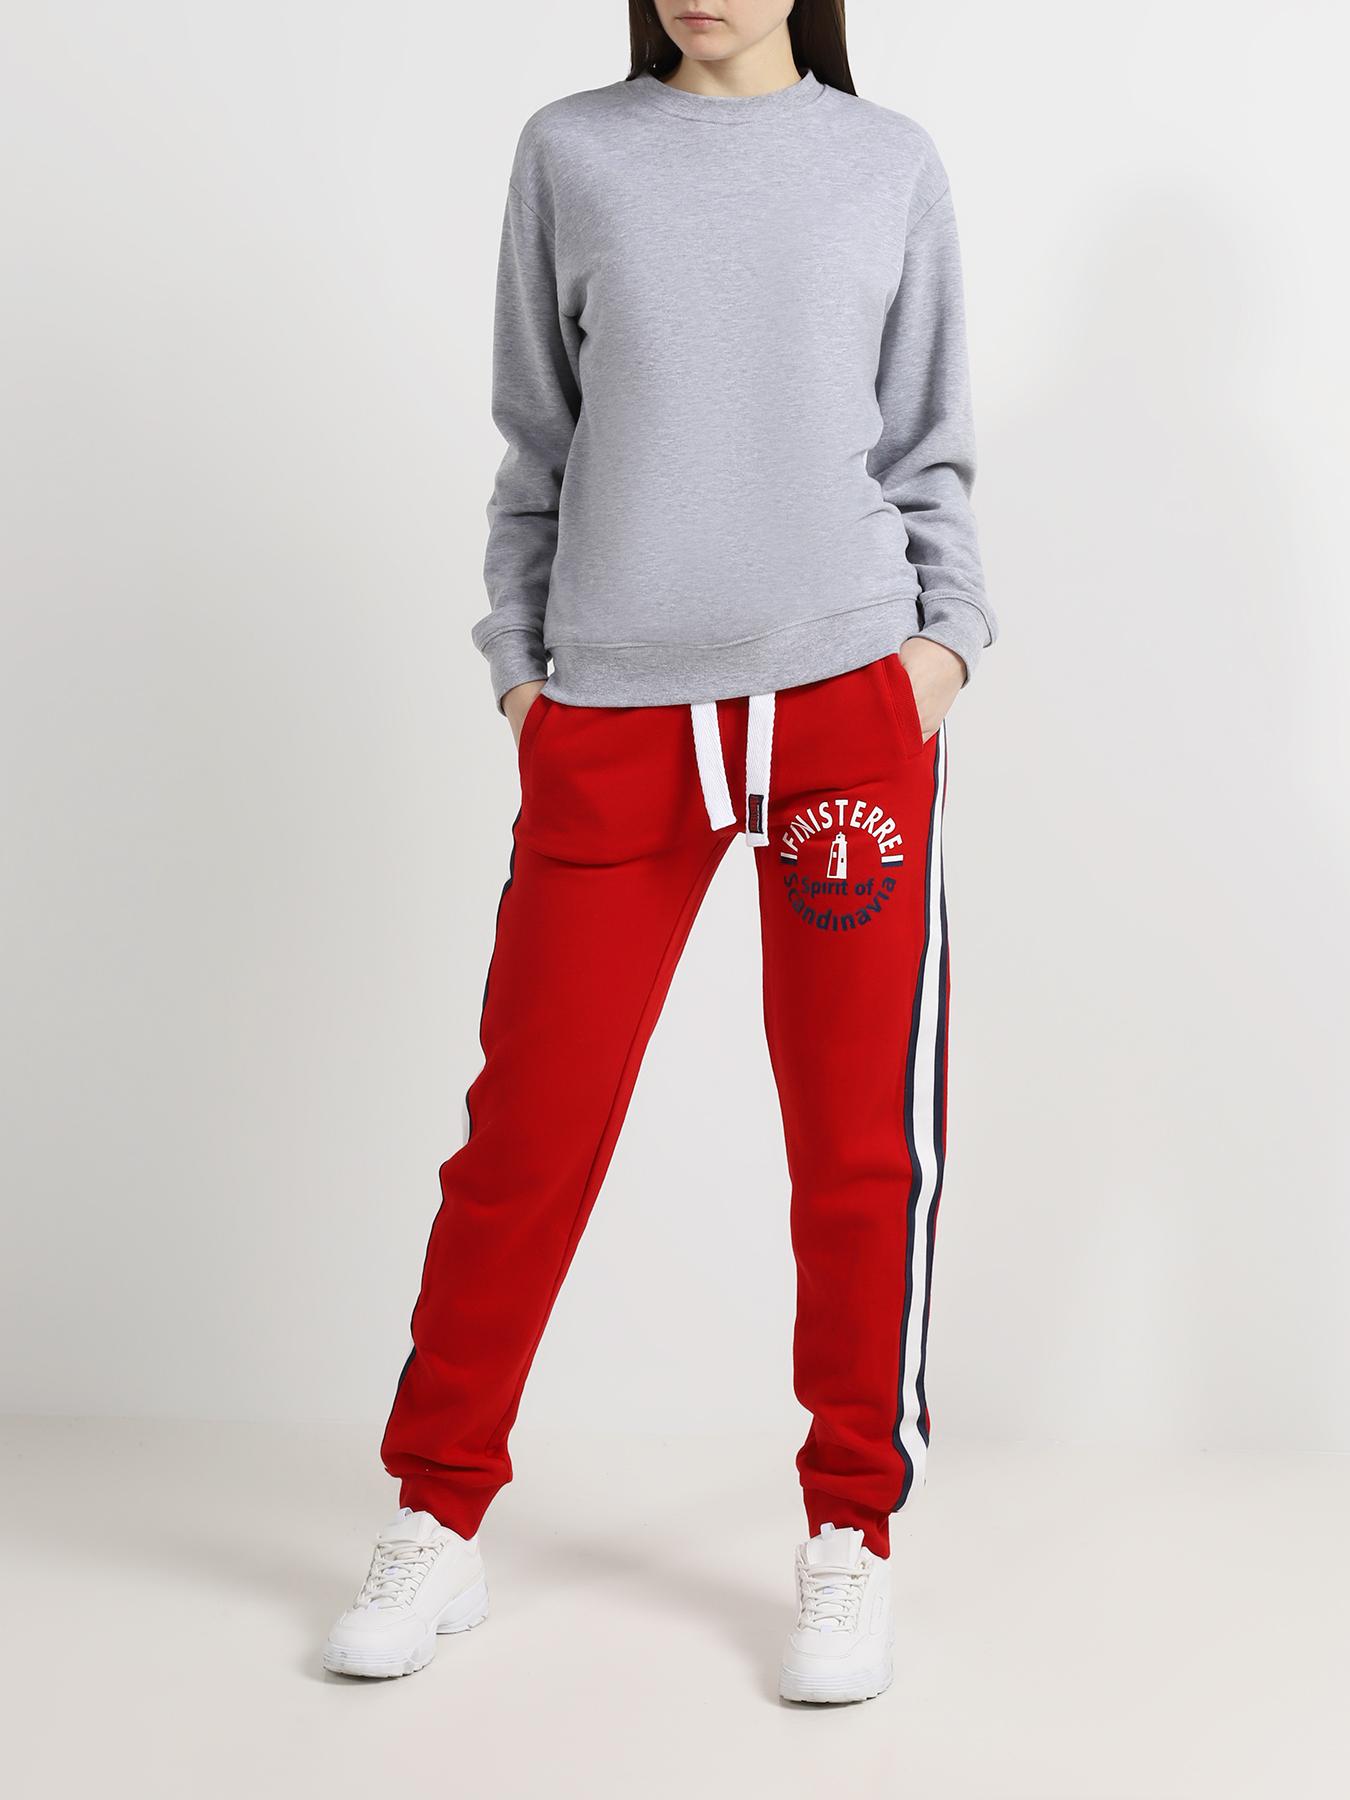 Finisterre Спортивные брюки фото